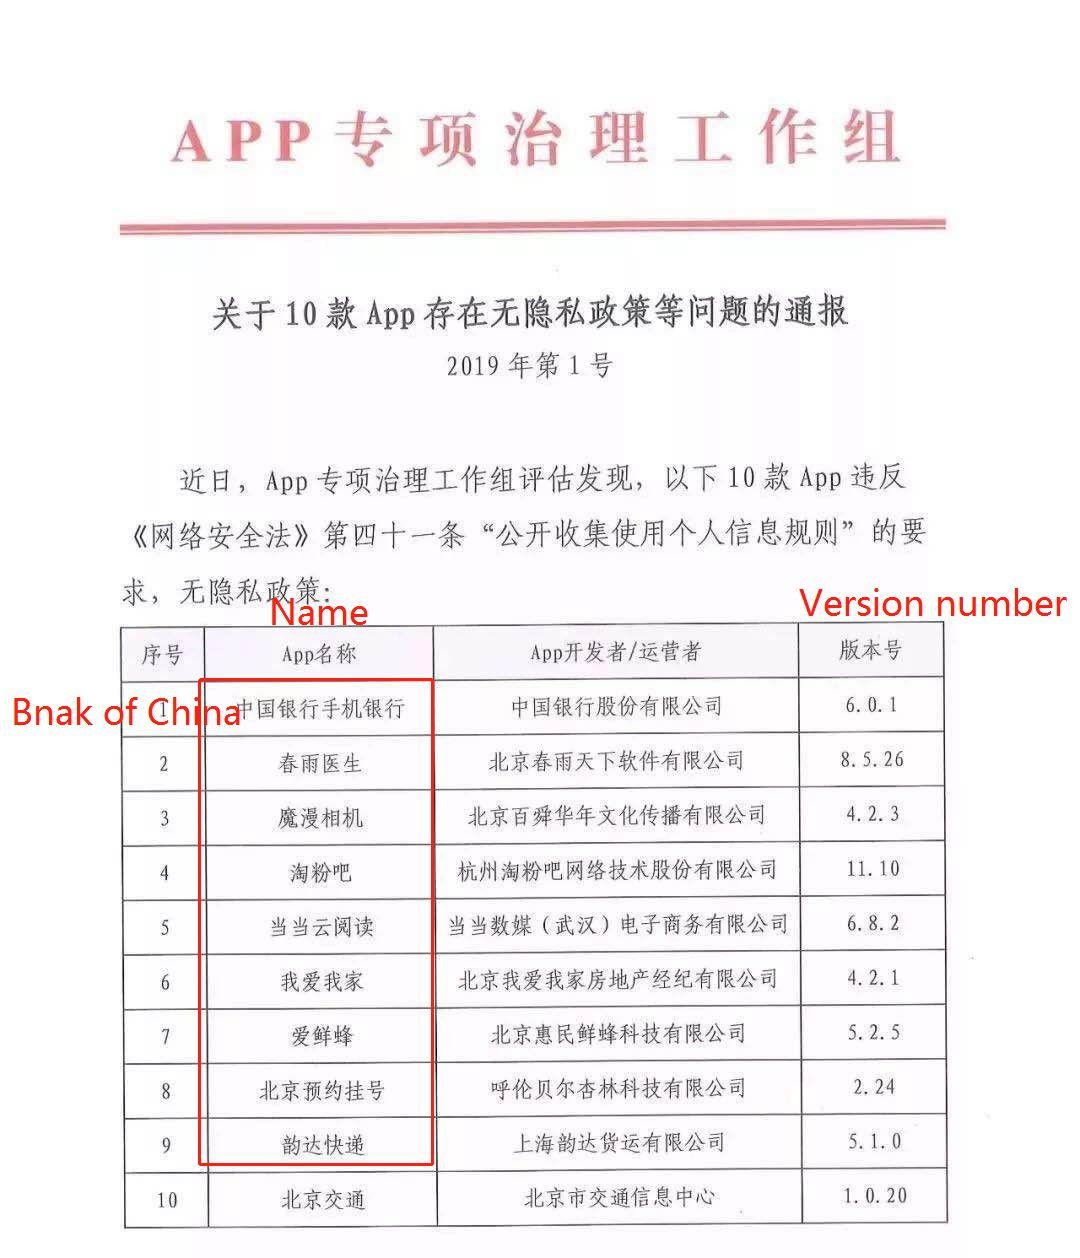 Illegal! 30 Apps Filch User's Secret, including Chinese Tinder!